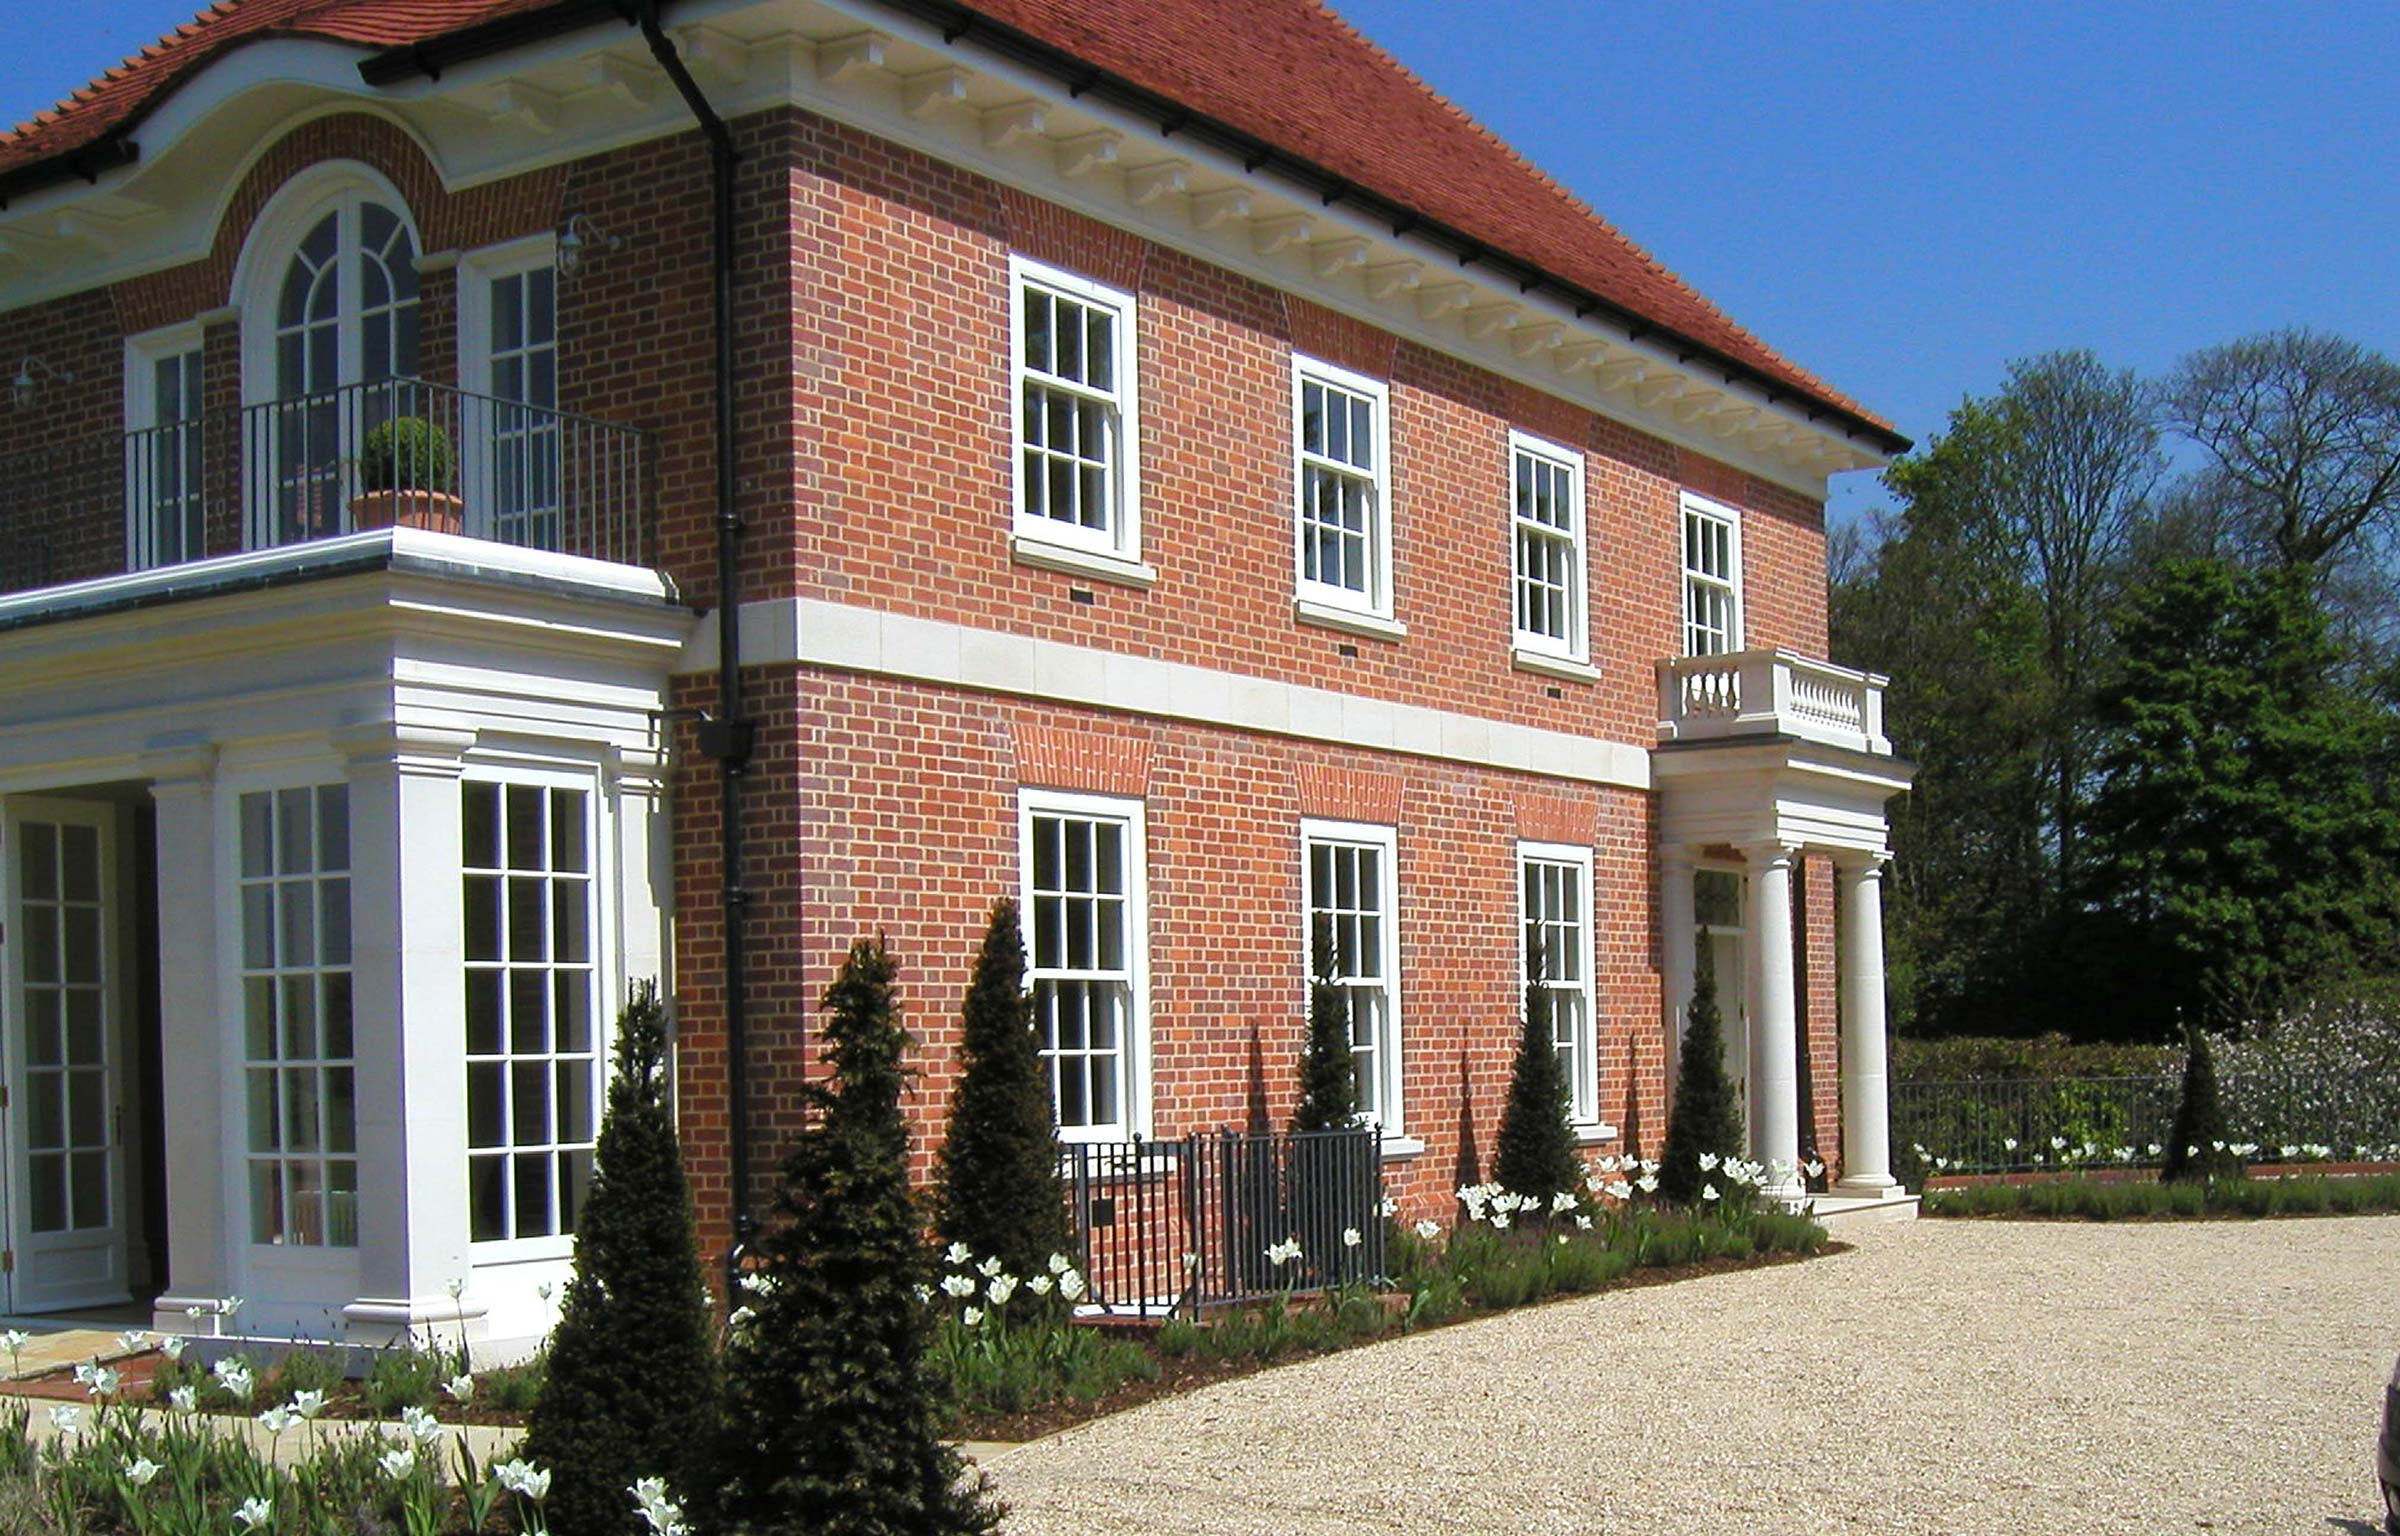 New house, Berkshire